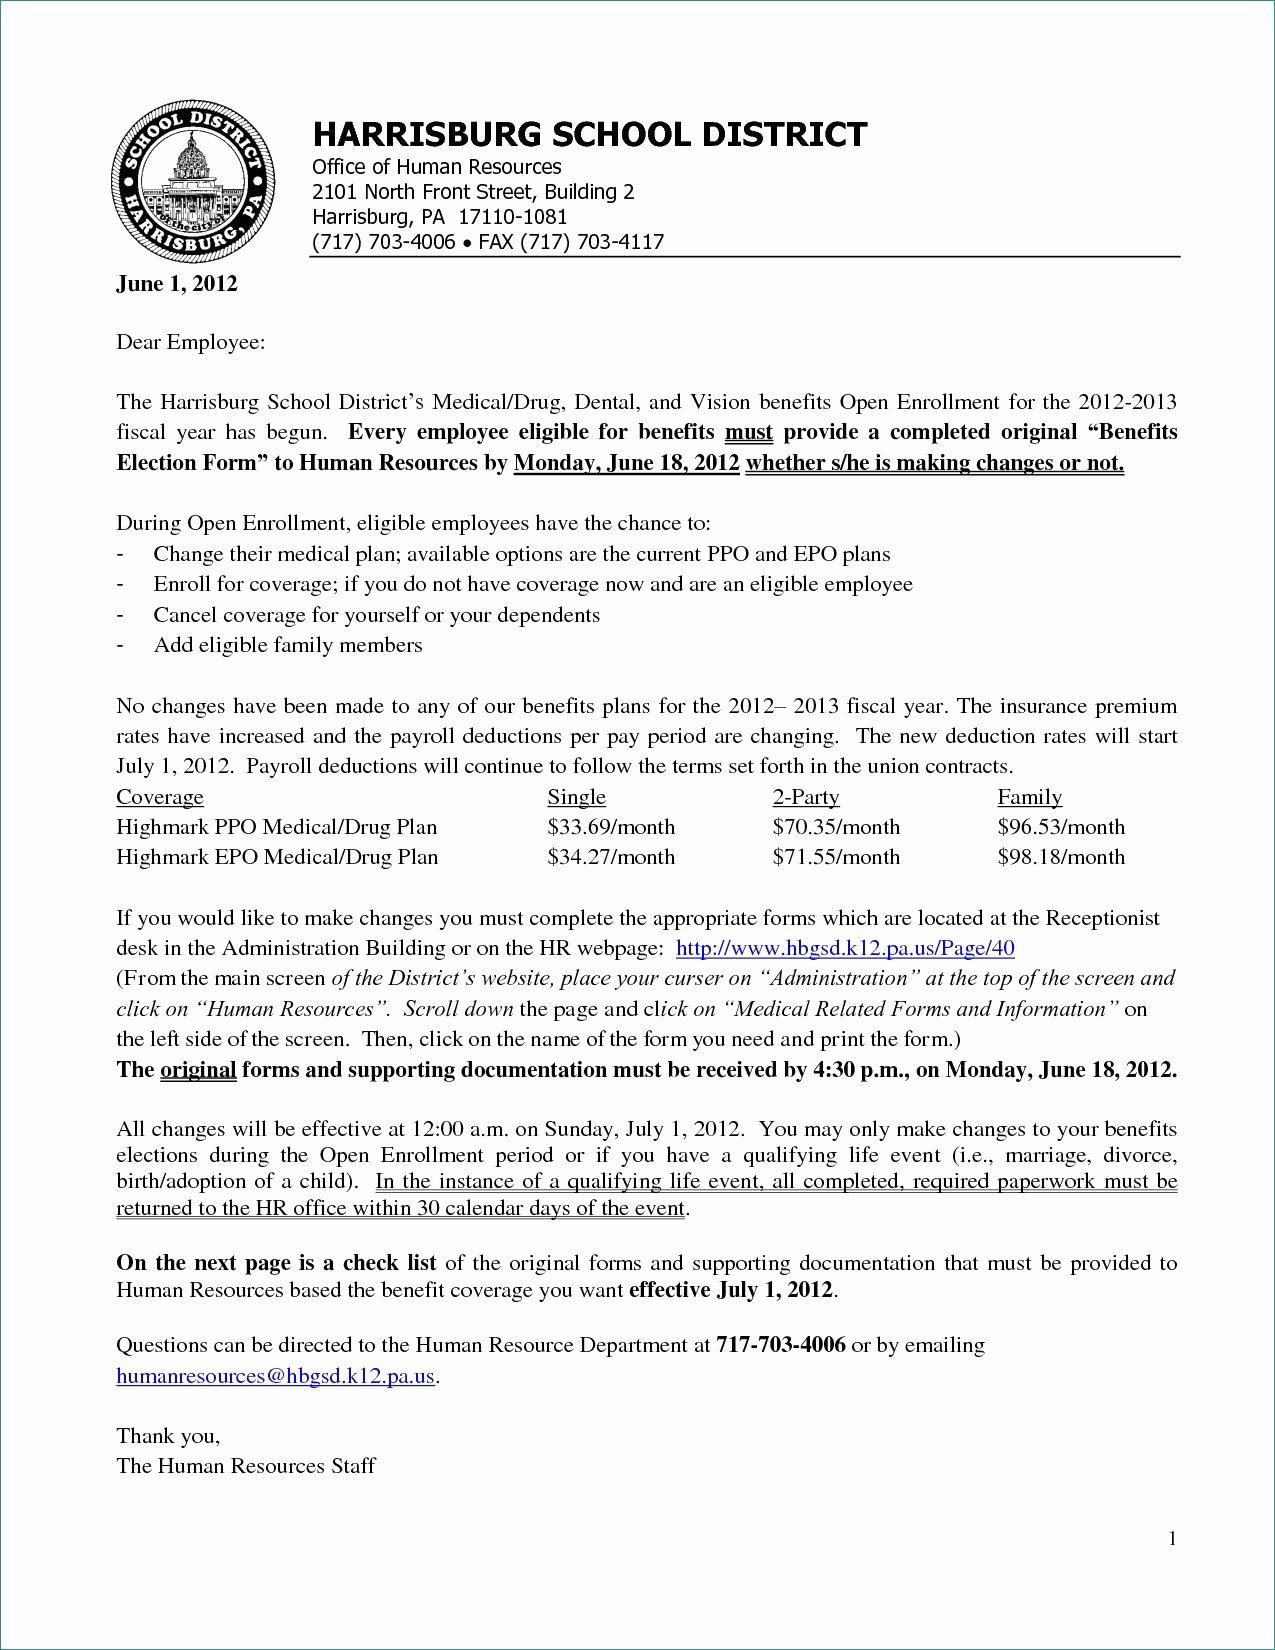 Open Enrollment Announcement Letter Beautiful Sample Letter to Employees Regarding Benefits Antique